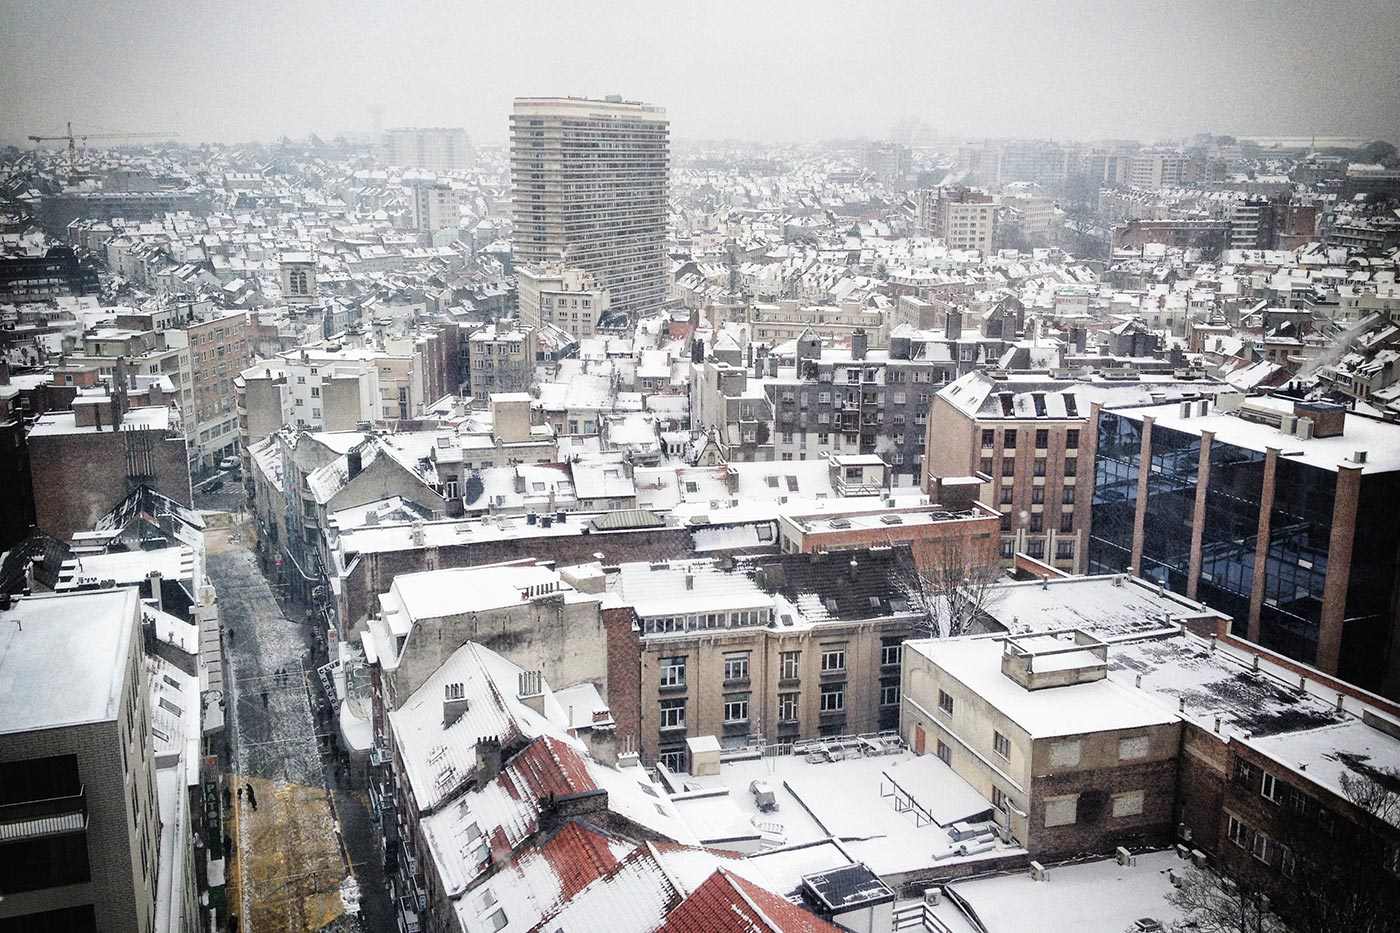 brussels_rooftops_in_winter_8521543482